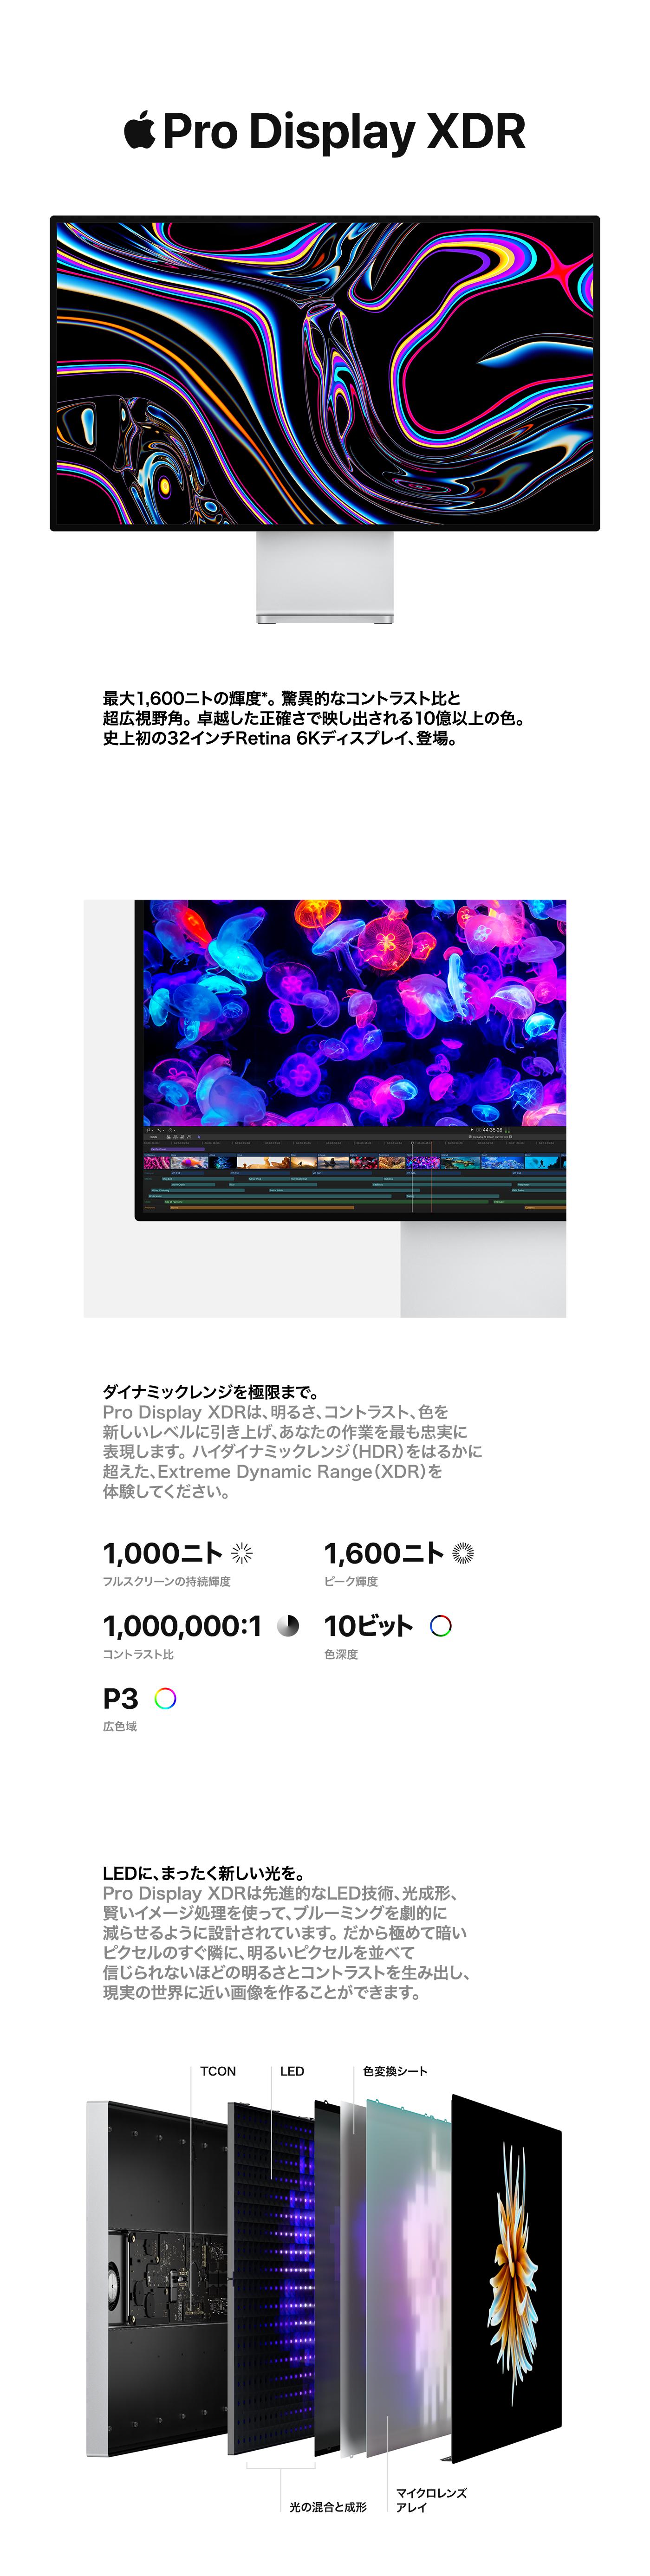 pro display XDR